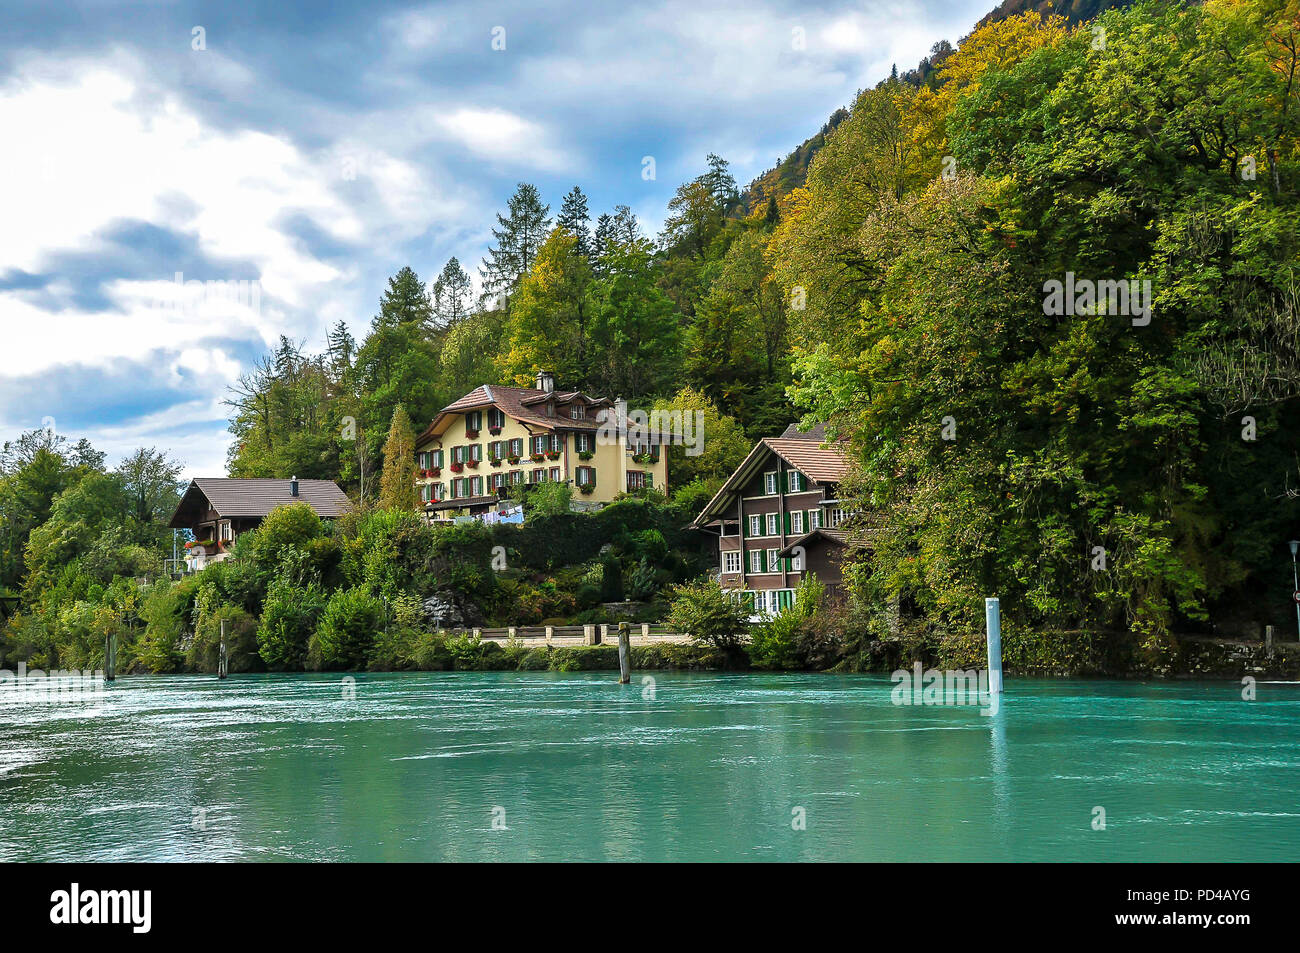 Interlaken Ost, Switzerland - Stock Image